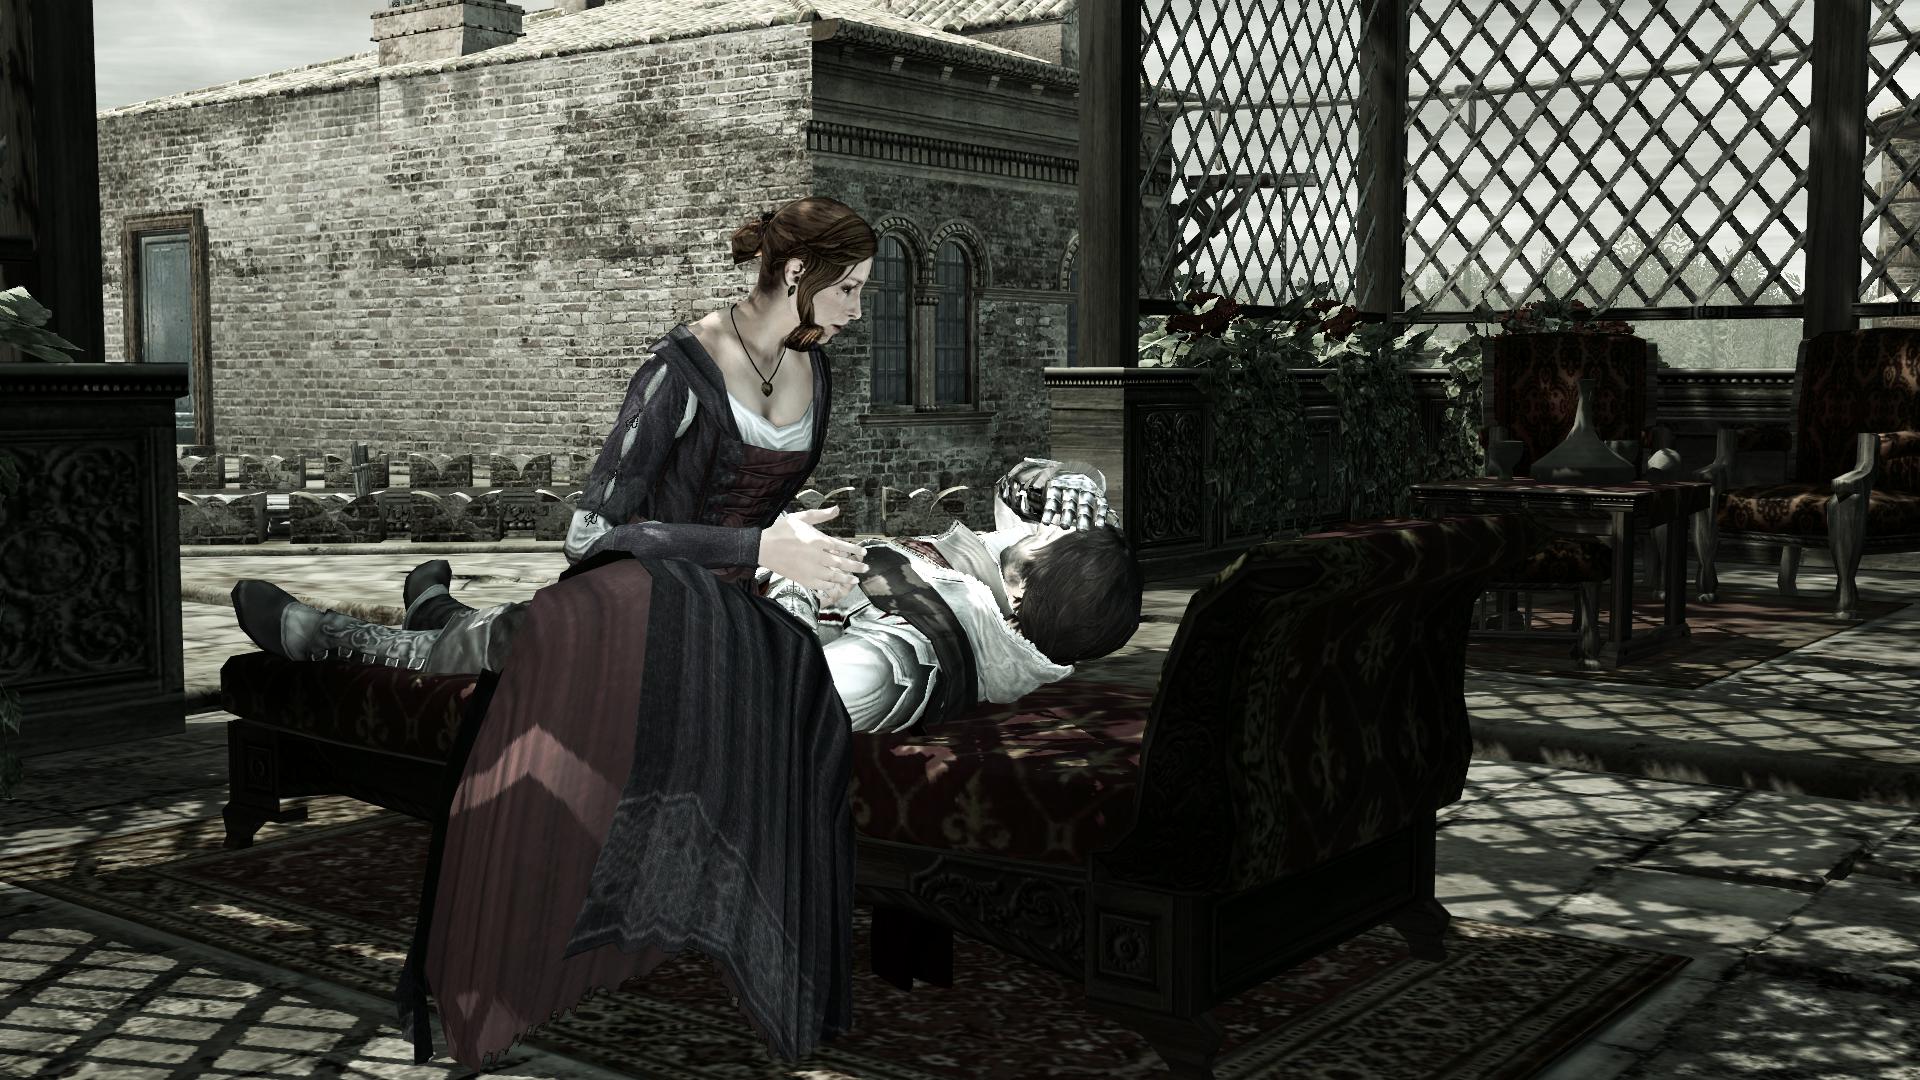 Caterina Sforza: biography 12